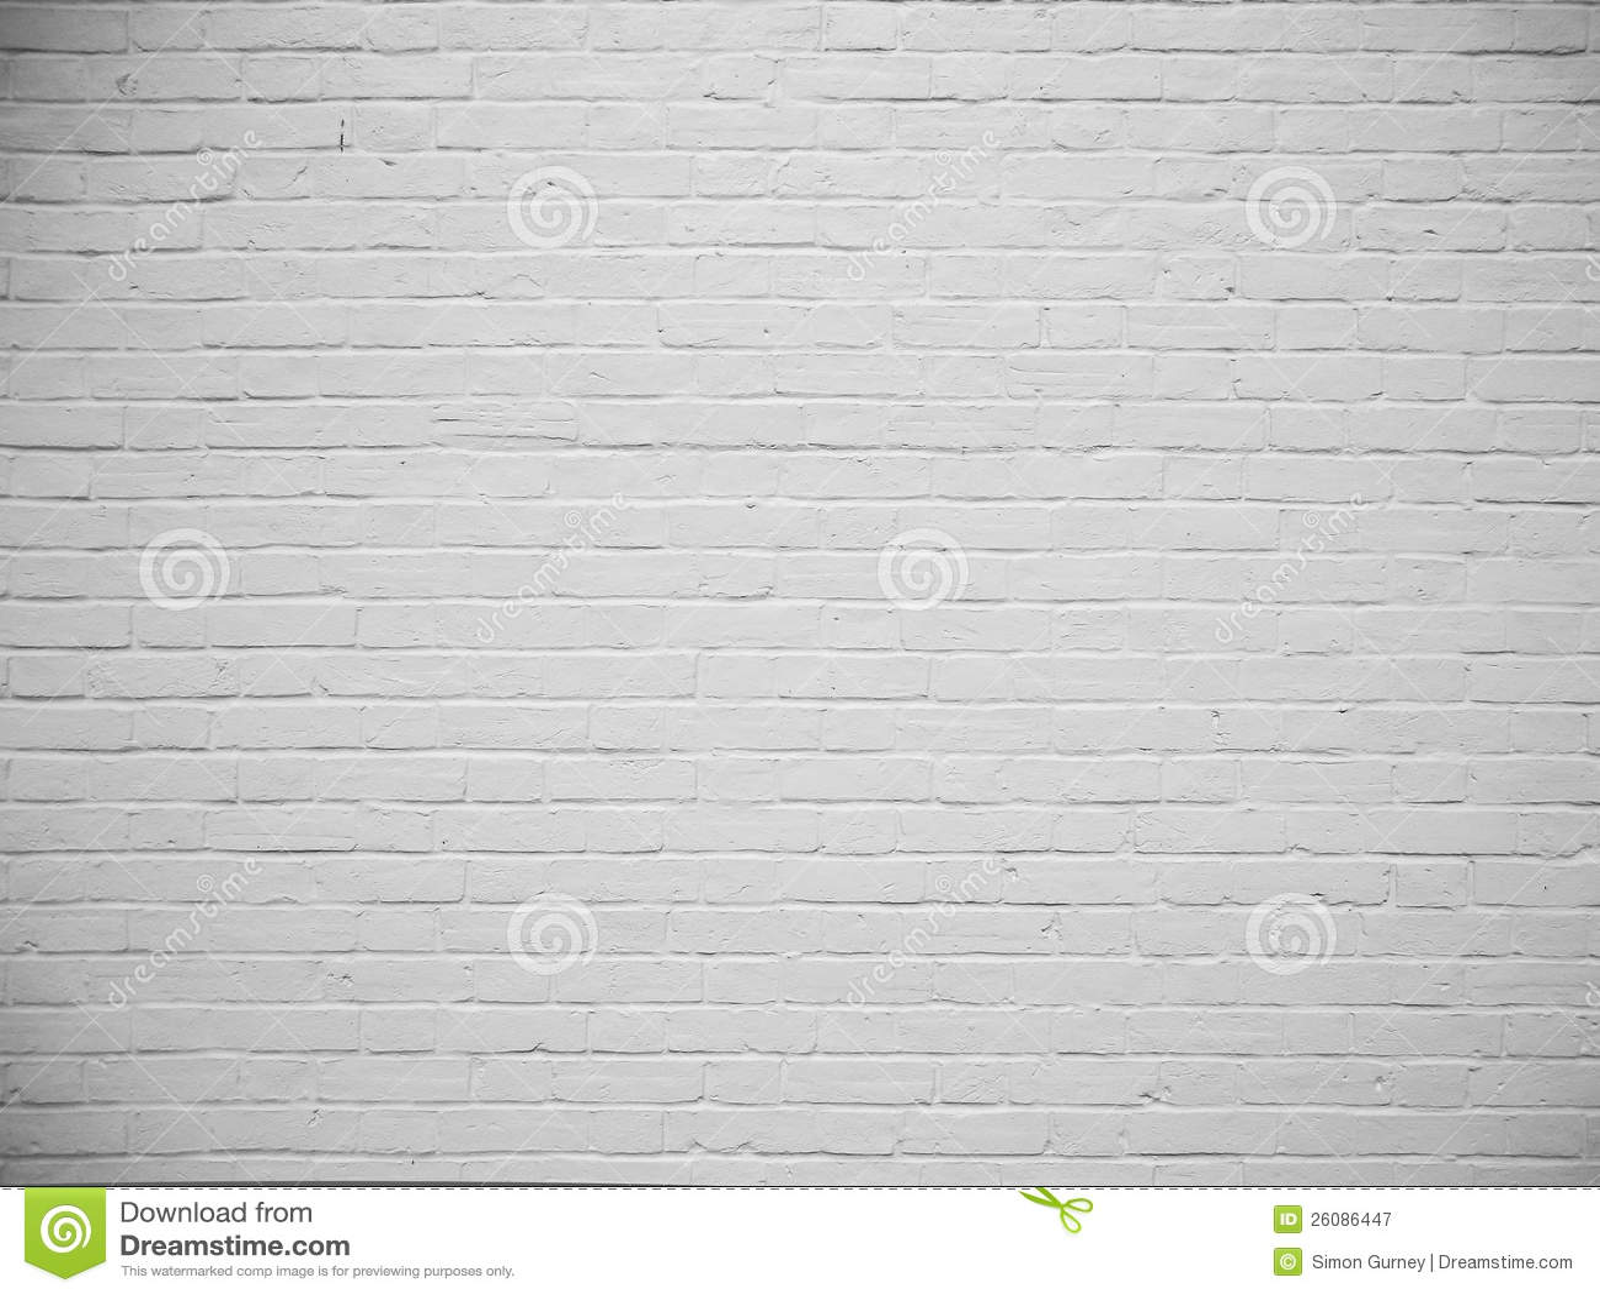 Blank vit målad tegelstenväggbakgrund